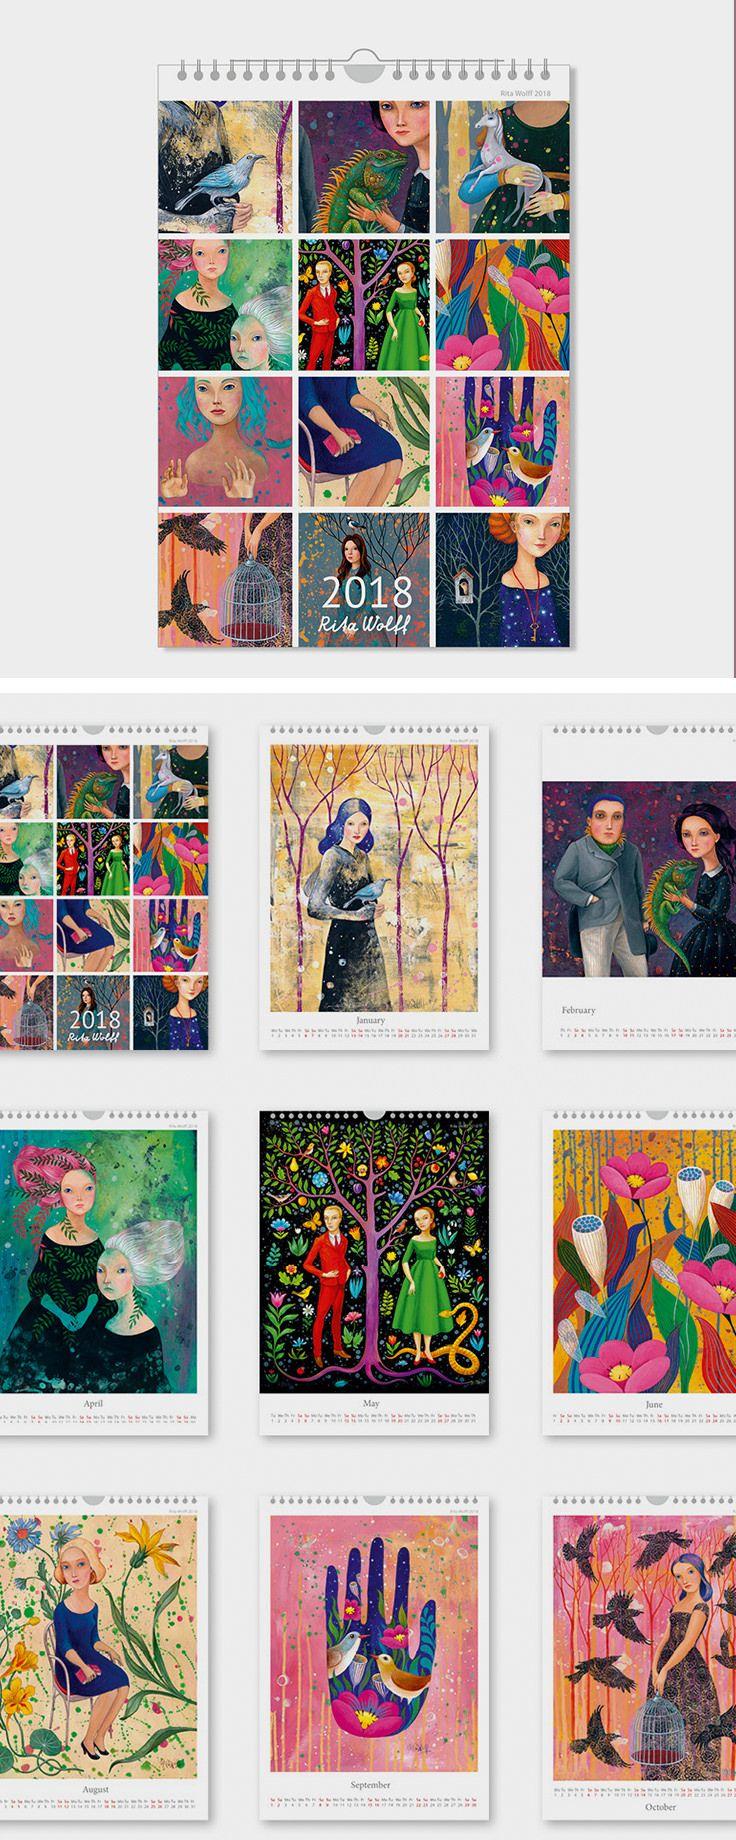 Handgemalter Wandkalender 2018 als Deko für den Flur / wall calendar 2018 for the hallway decoration made by Rita Wolff via DaWanda.com